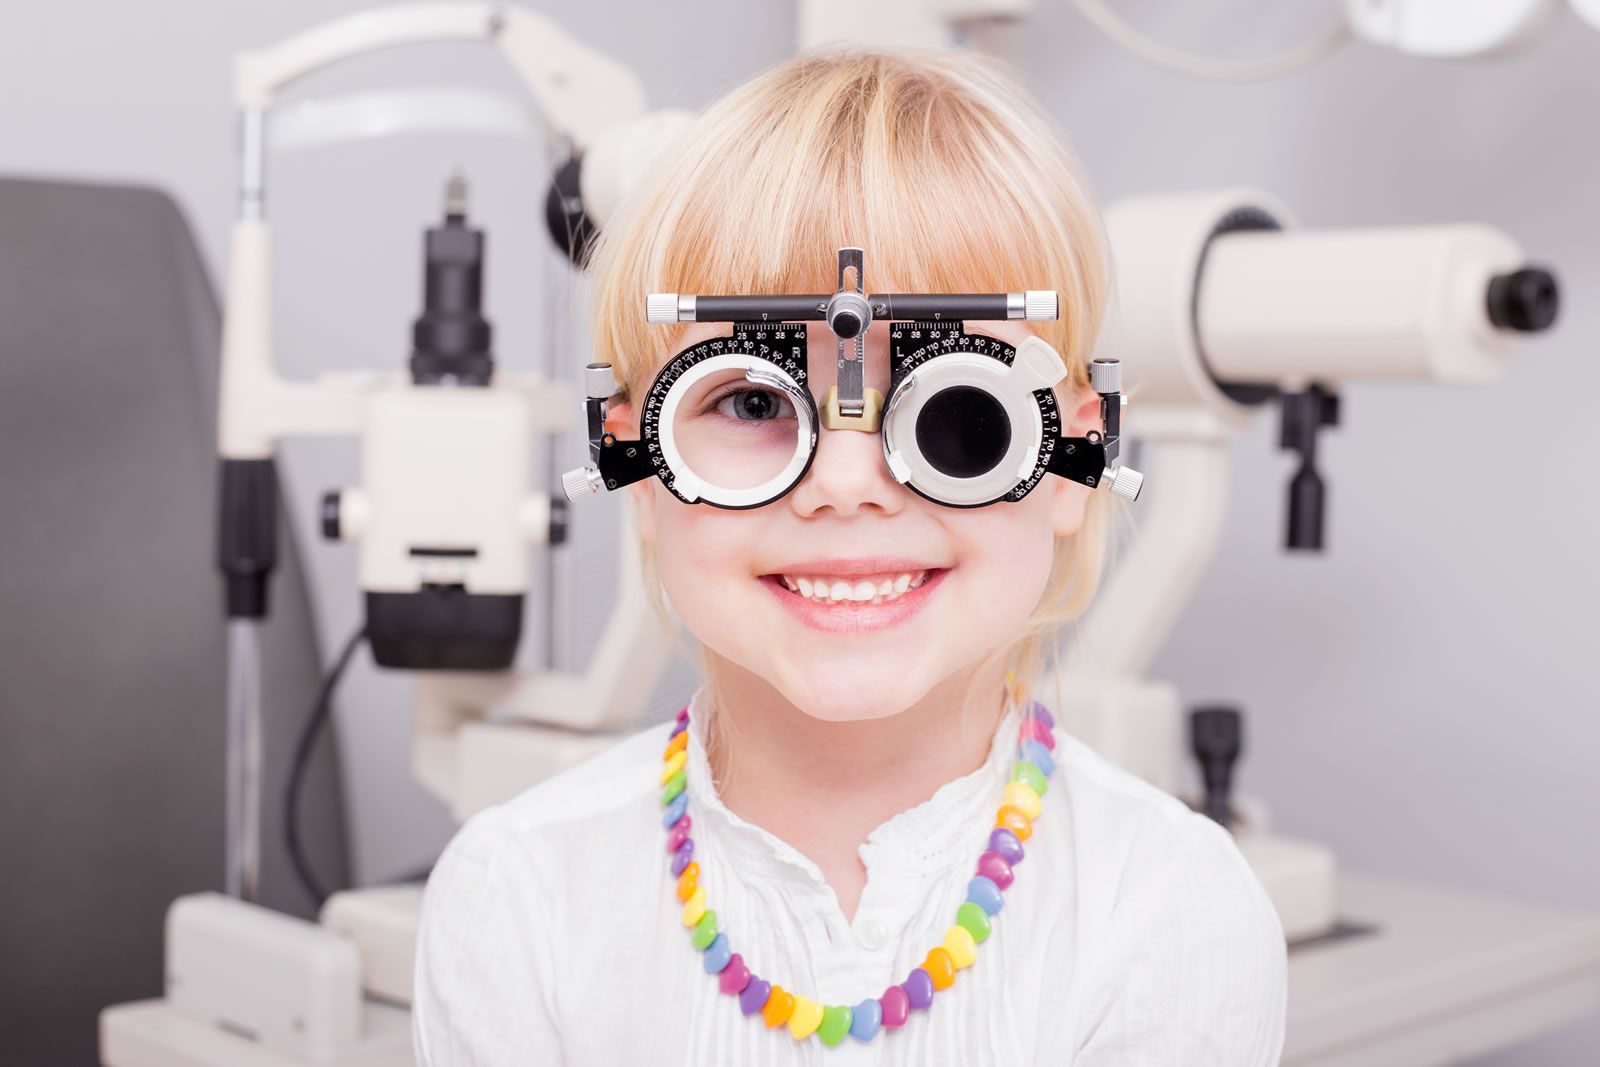 oftalmopediatria em Brasilia - exame 1